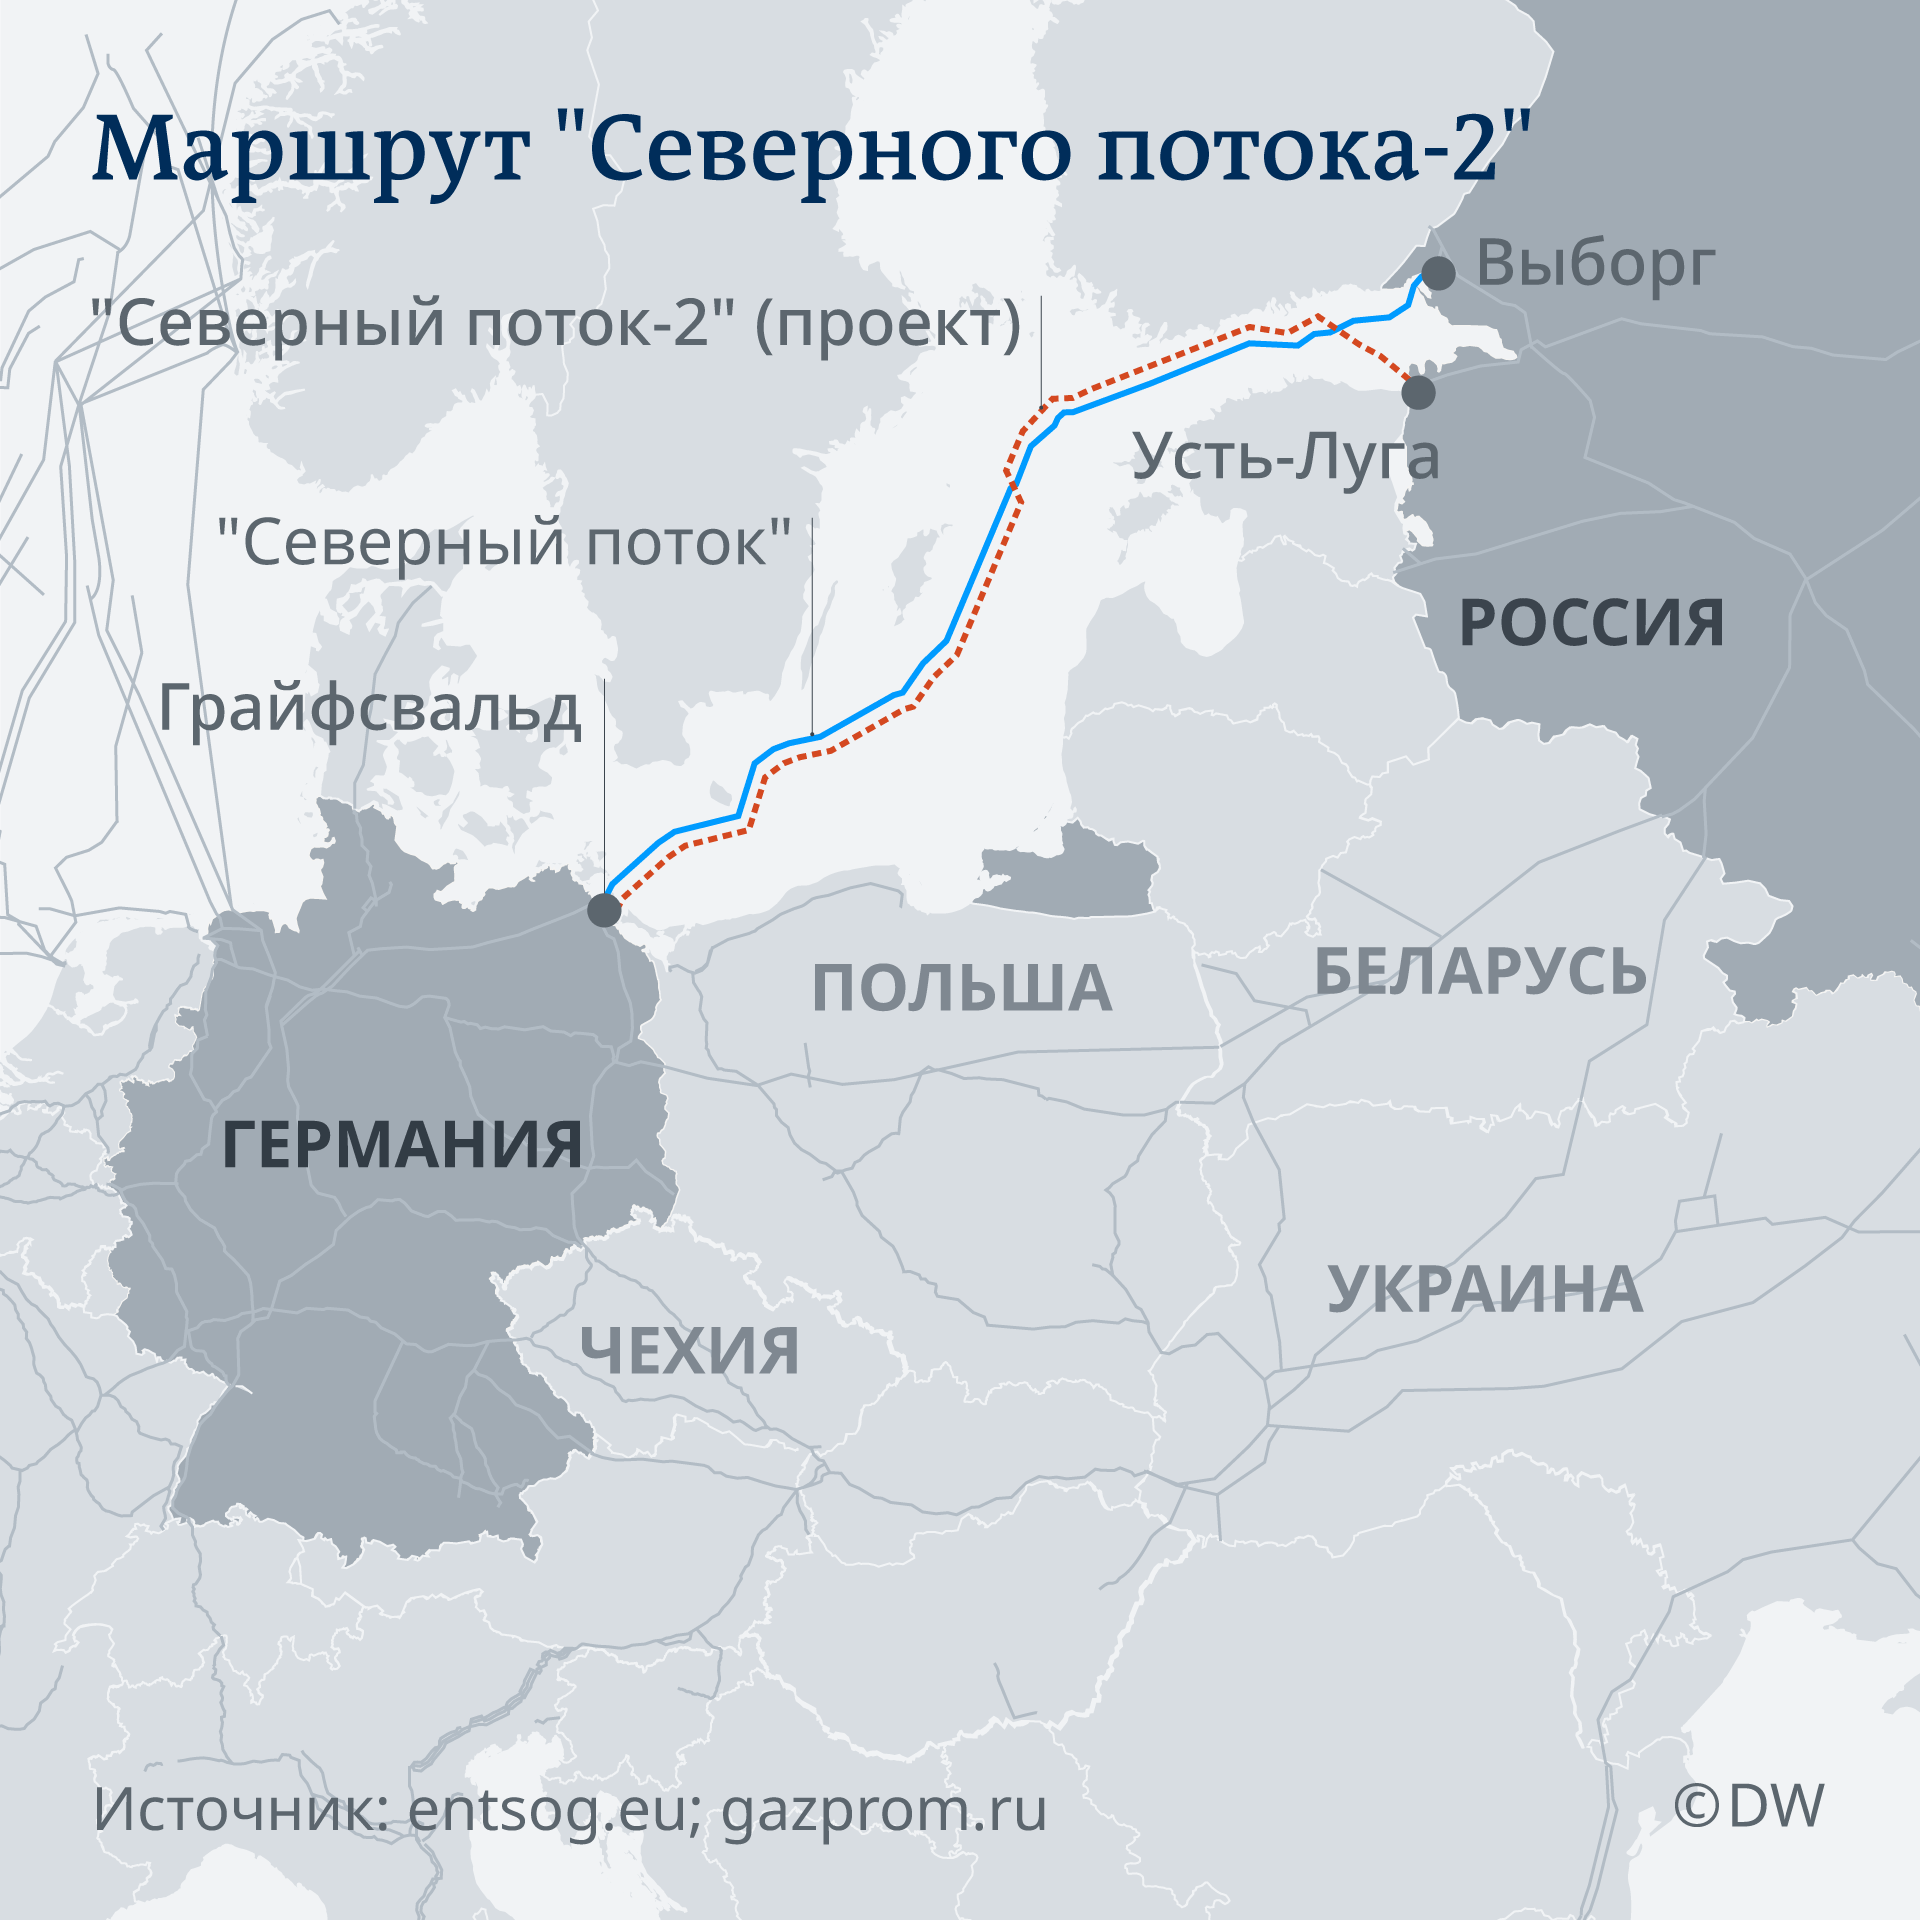 Nord Stream 2 Karte.Nord Stream 2 Grozit Es Sudom Iz Za Trebovanij Gazovoj